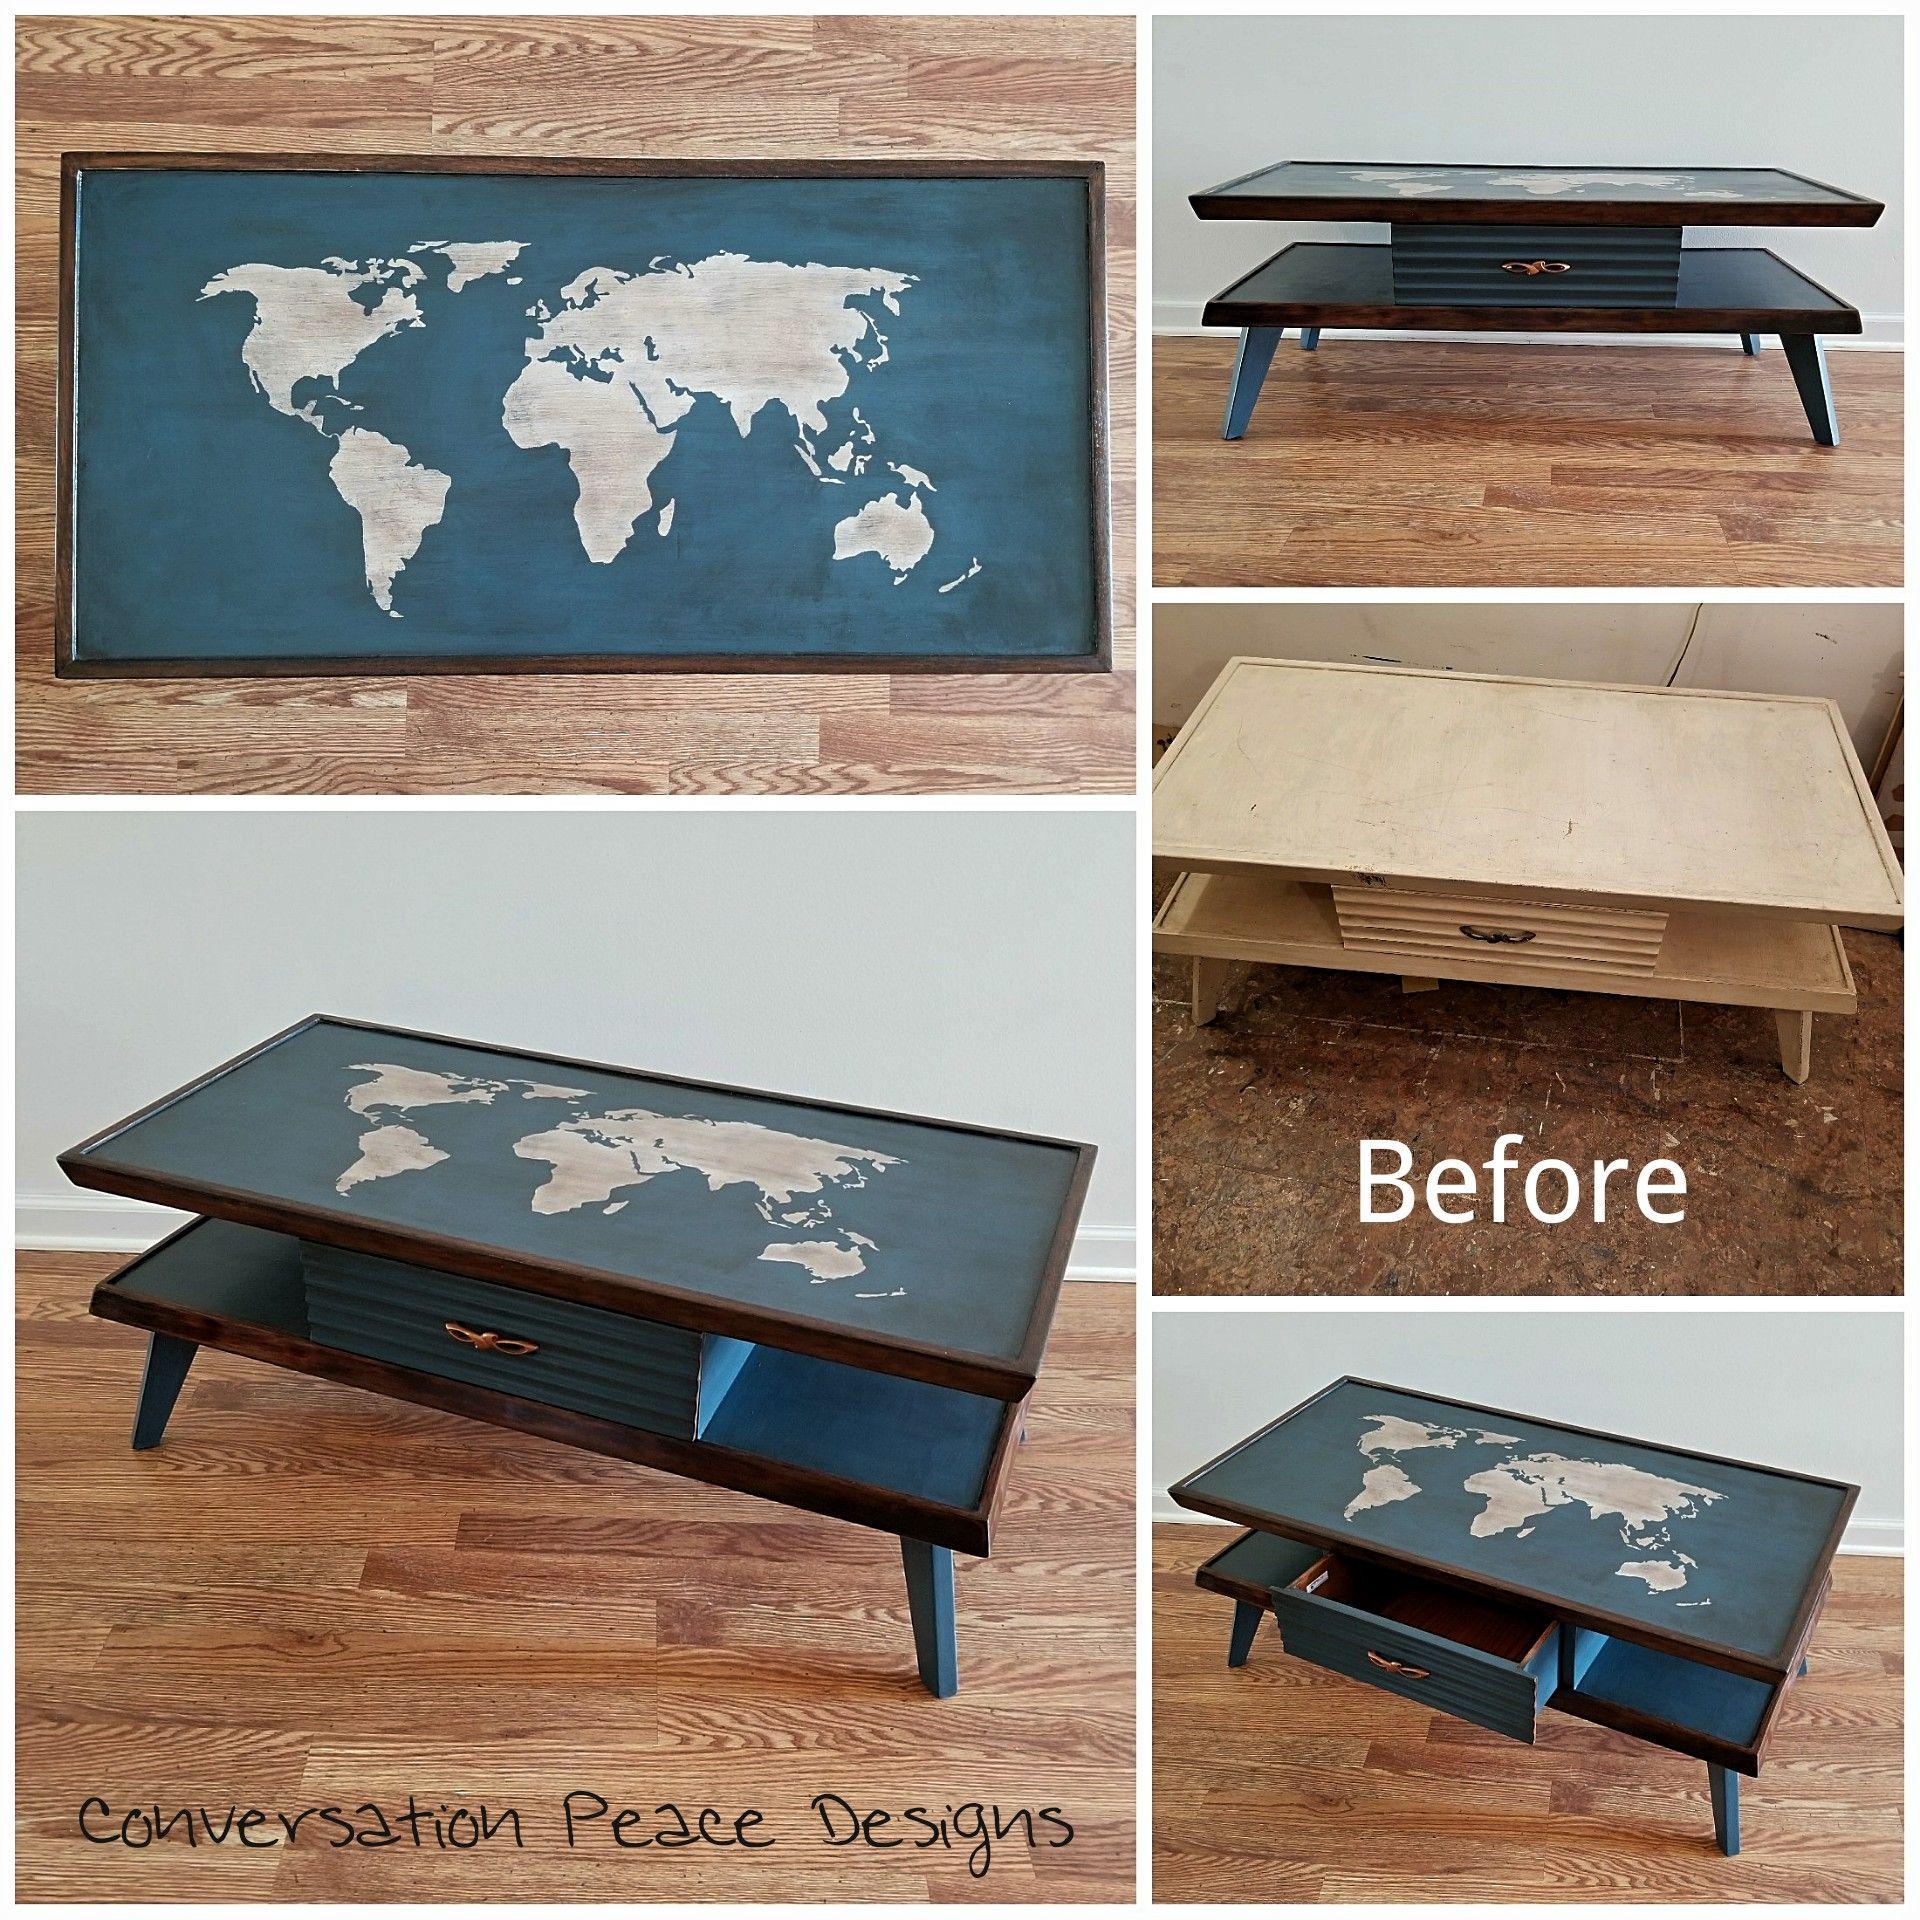 Mcm Coffee Table Refinish #Midcentury #Mcmfurniture #Refinishedfurniture #Worldmap